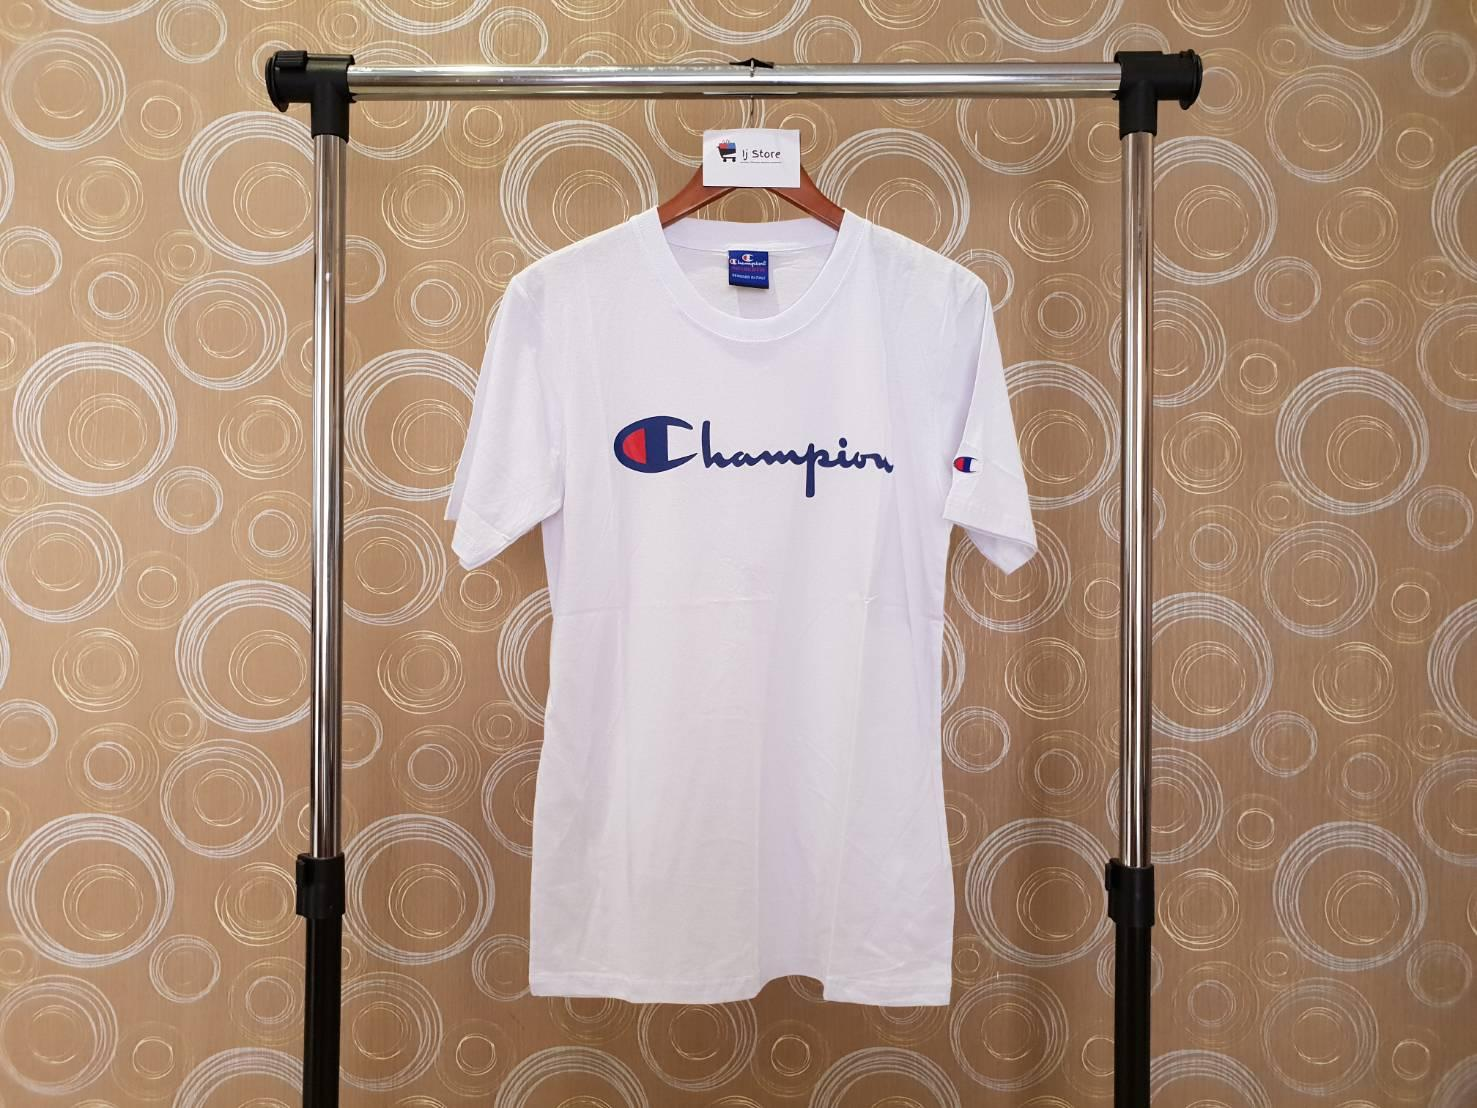 Kaos champion logo import distro high quality putih unisex